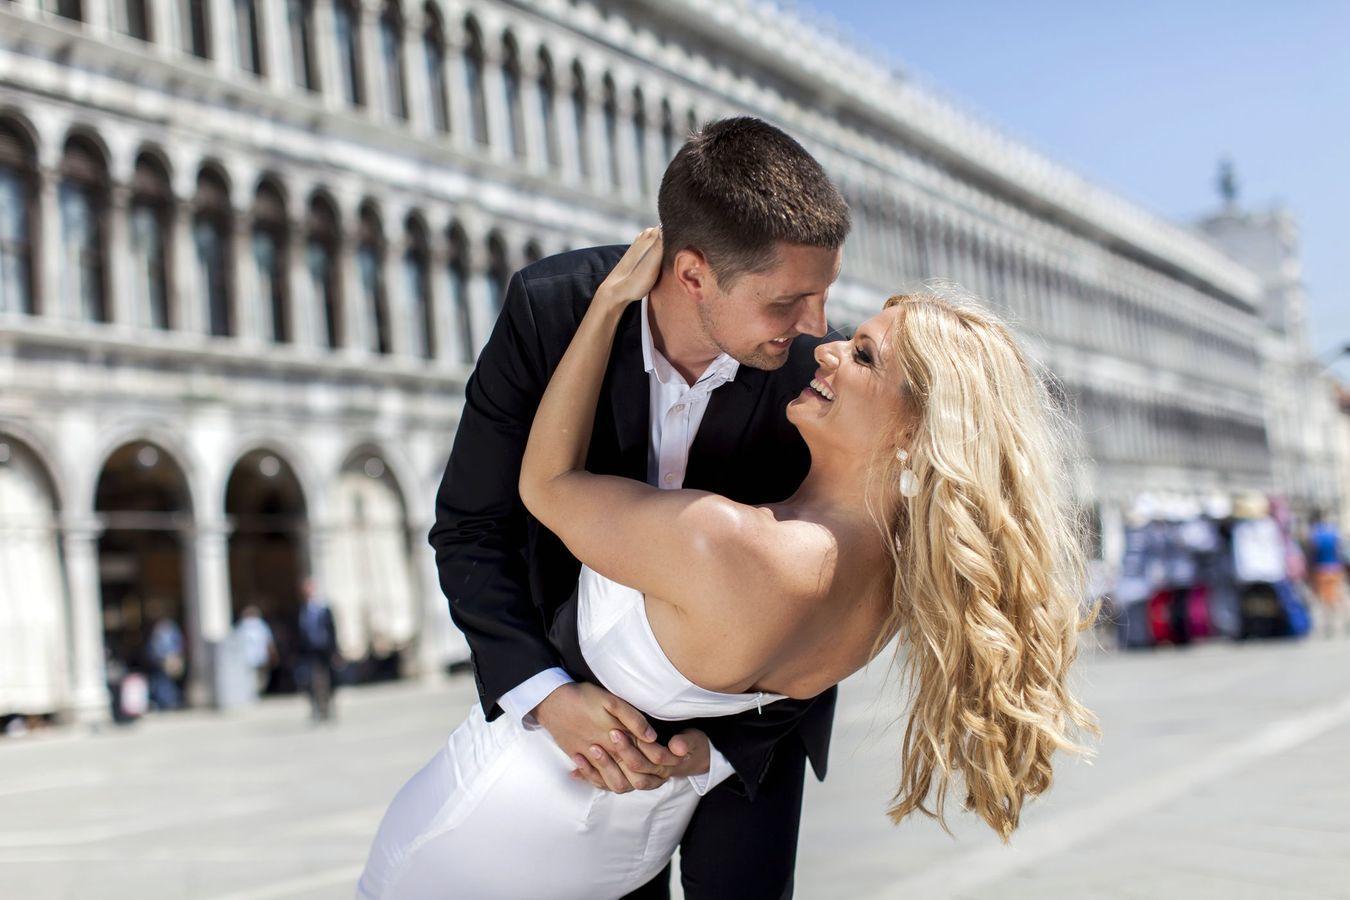 romantic-elope-in-italy-1350×900